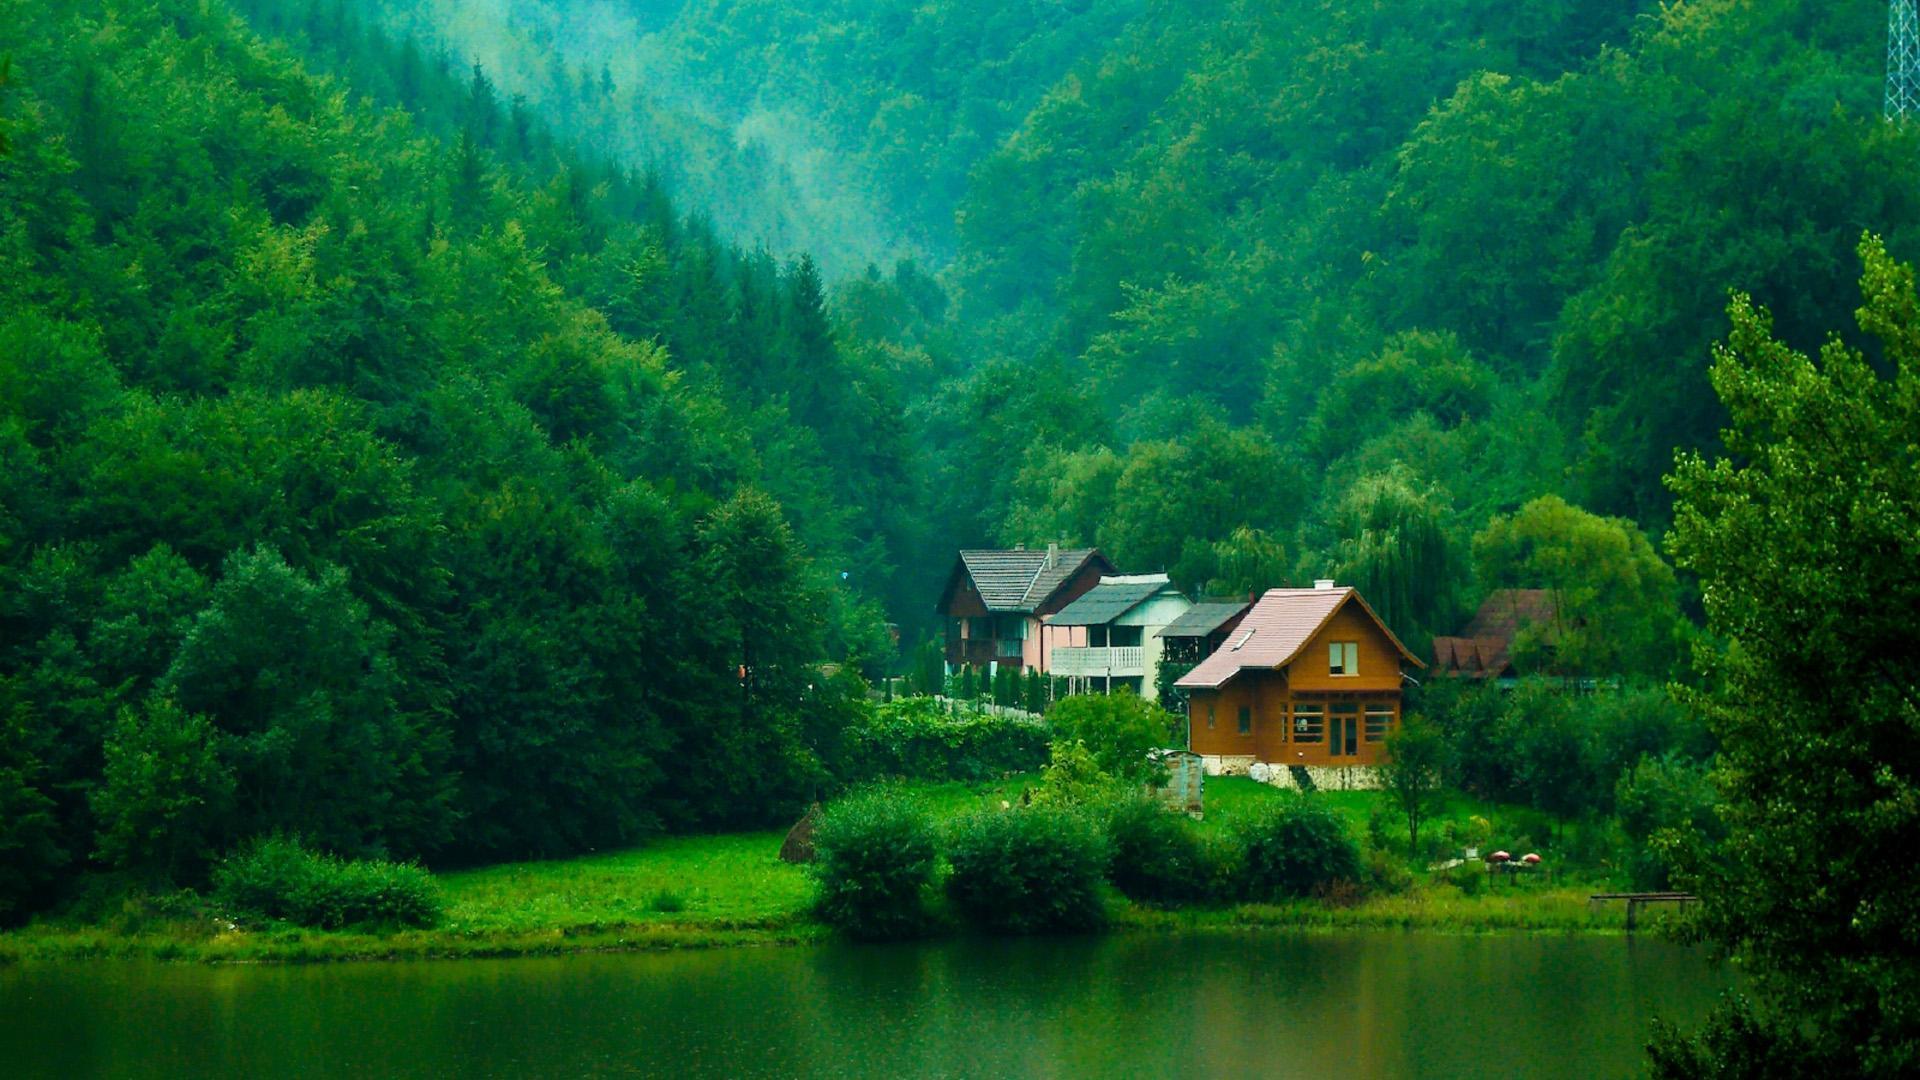 Indonesian natural green